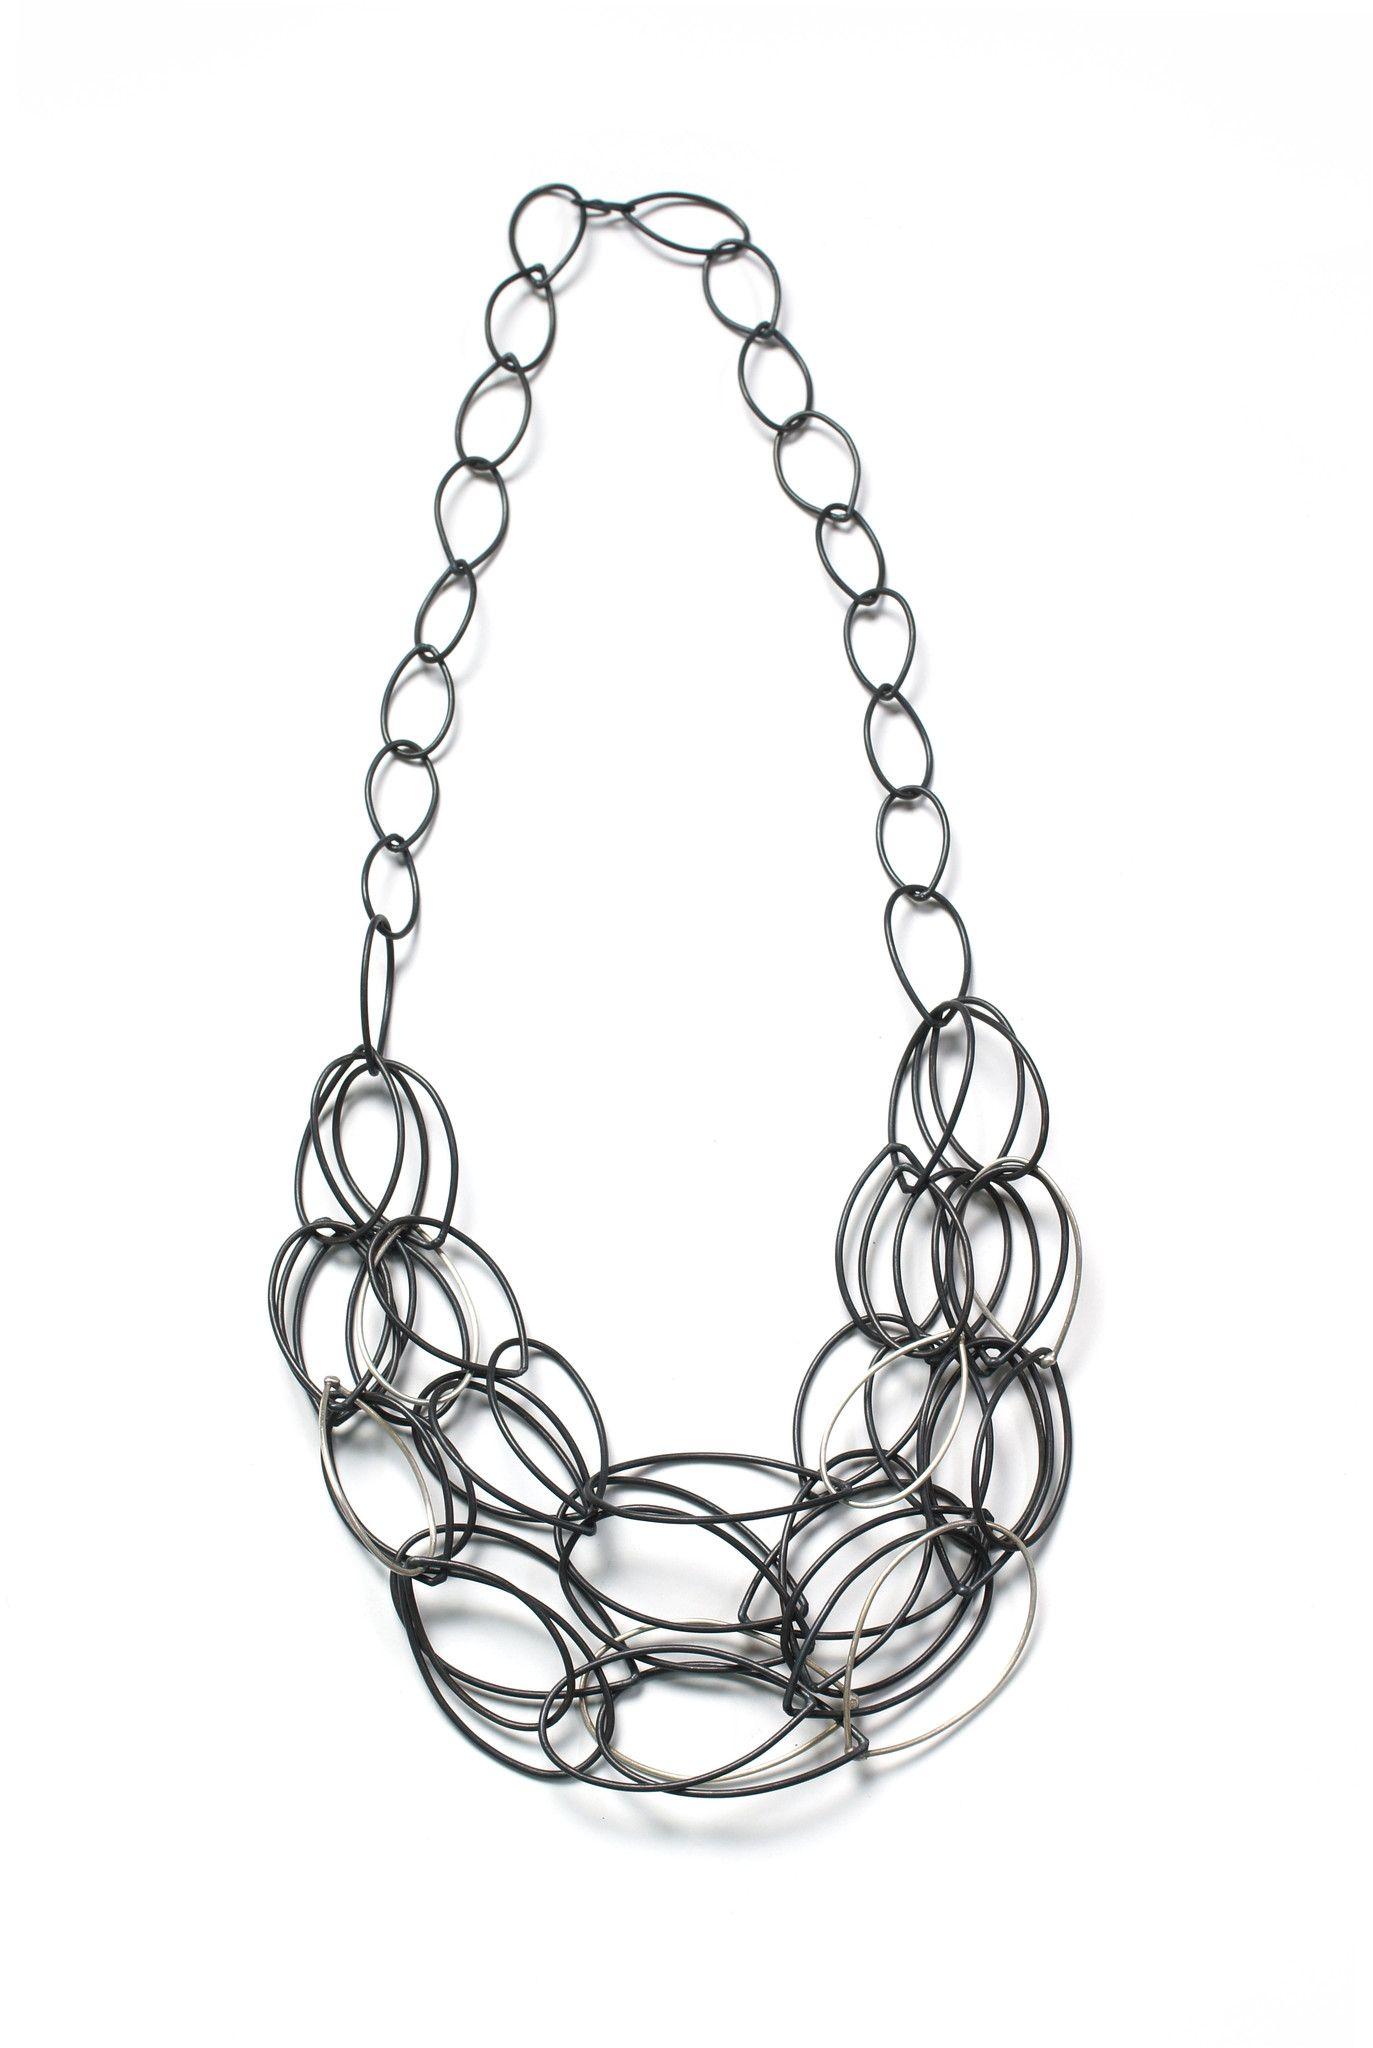 long Maya necklace - sample sale